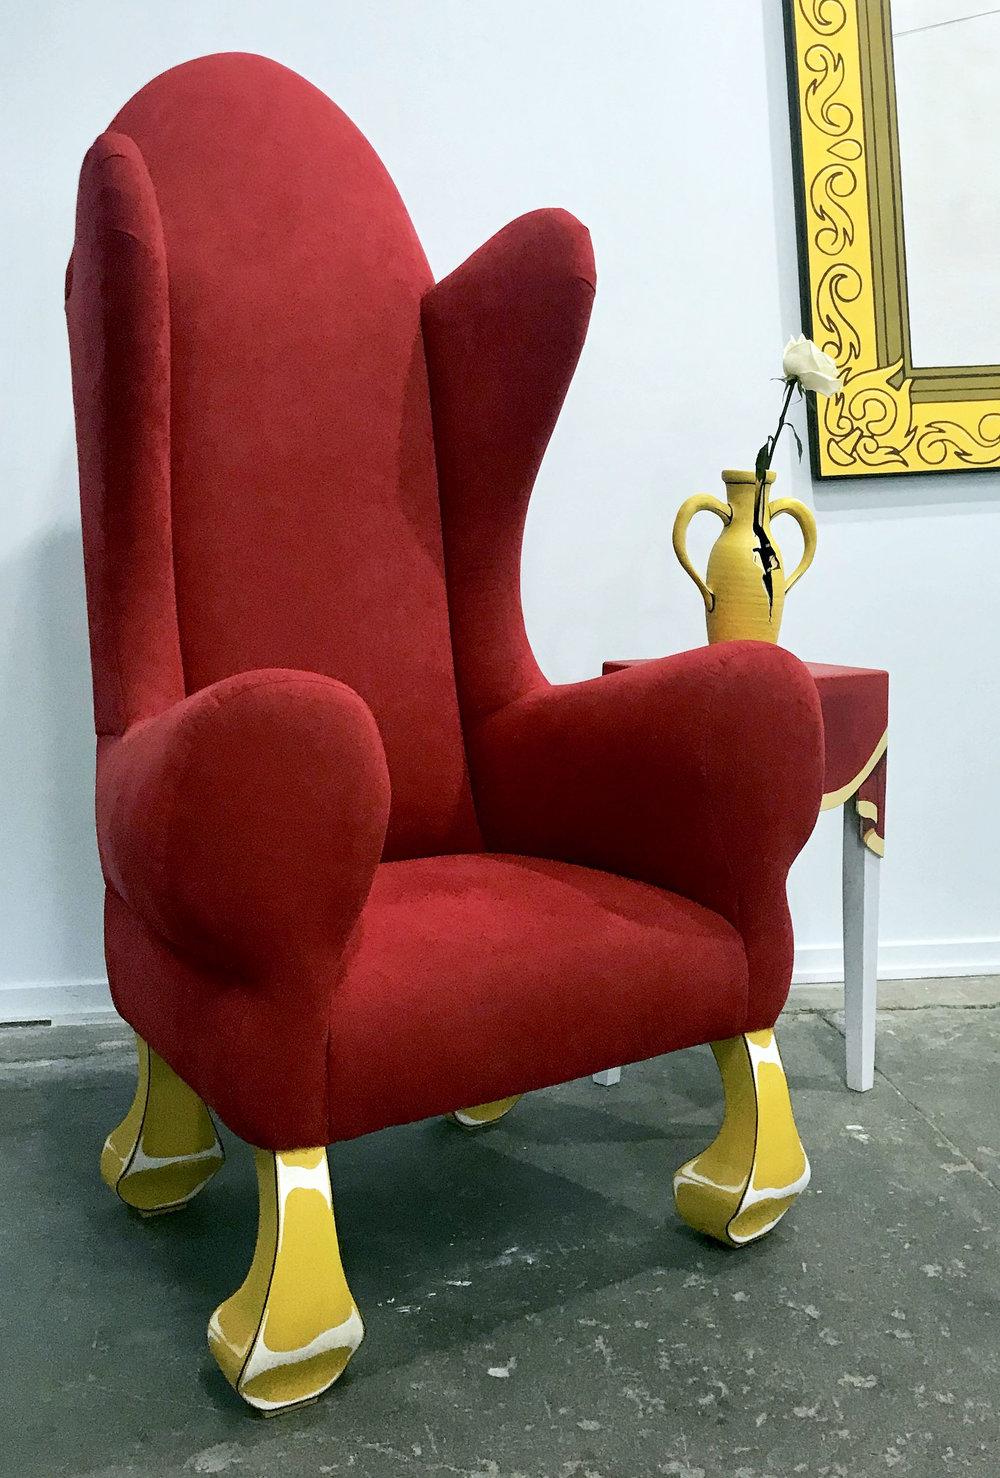 power_chair.jpg